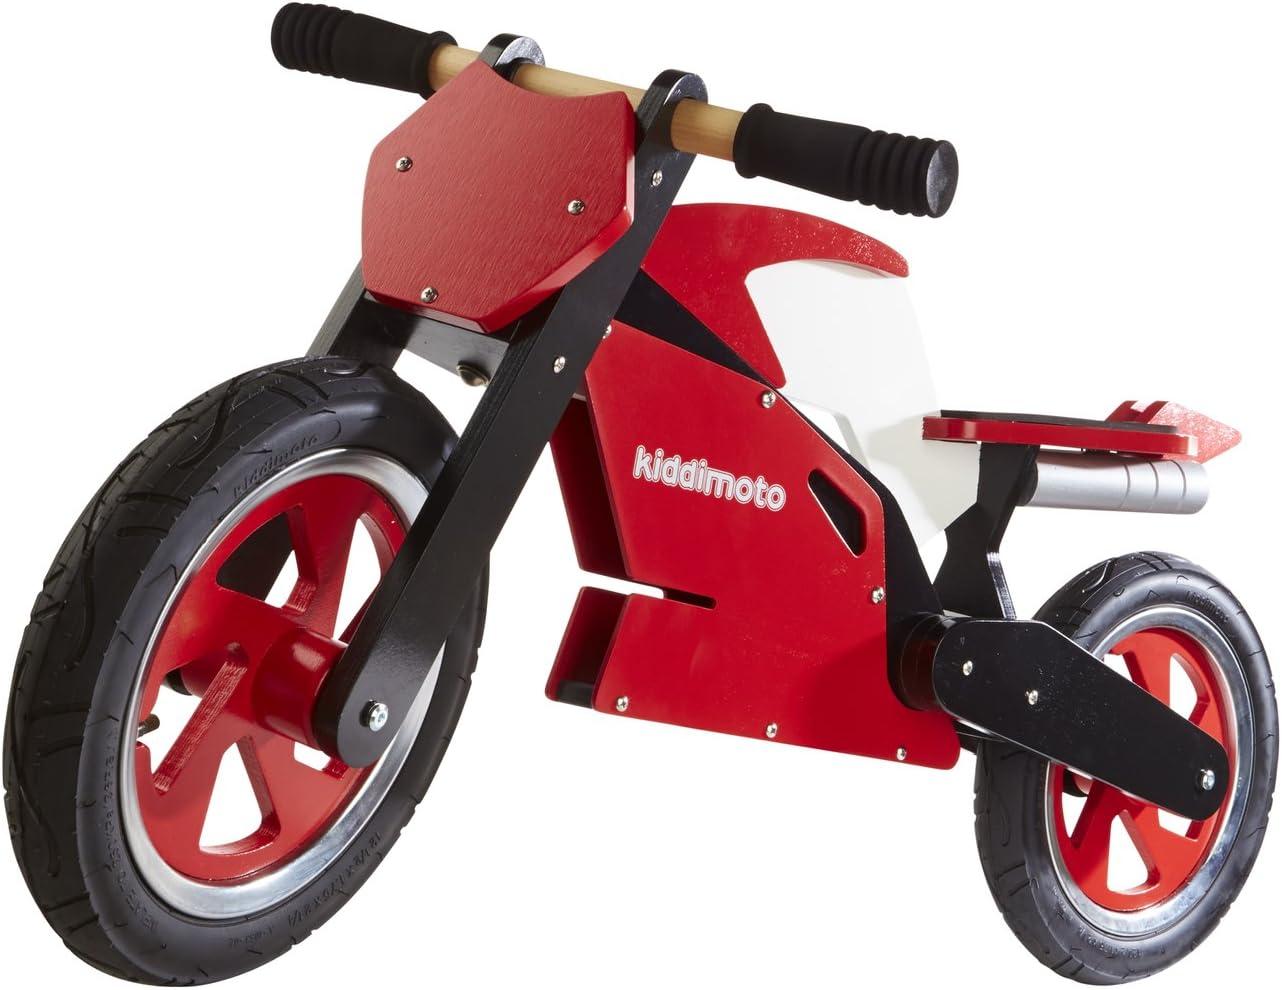 B002KJ95EQ Kiddimoto Kid's Superbike Balance/Running Bike in 2 Colors 71Sfd-MAssL